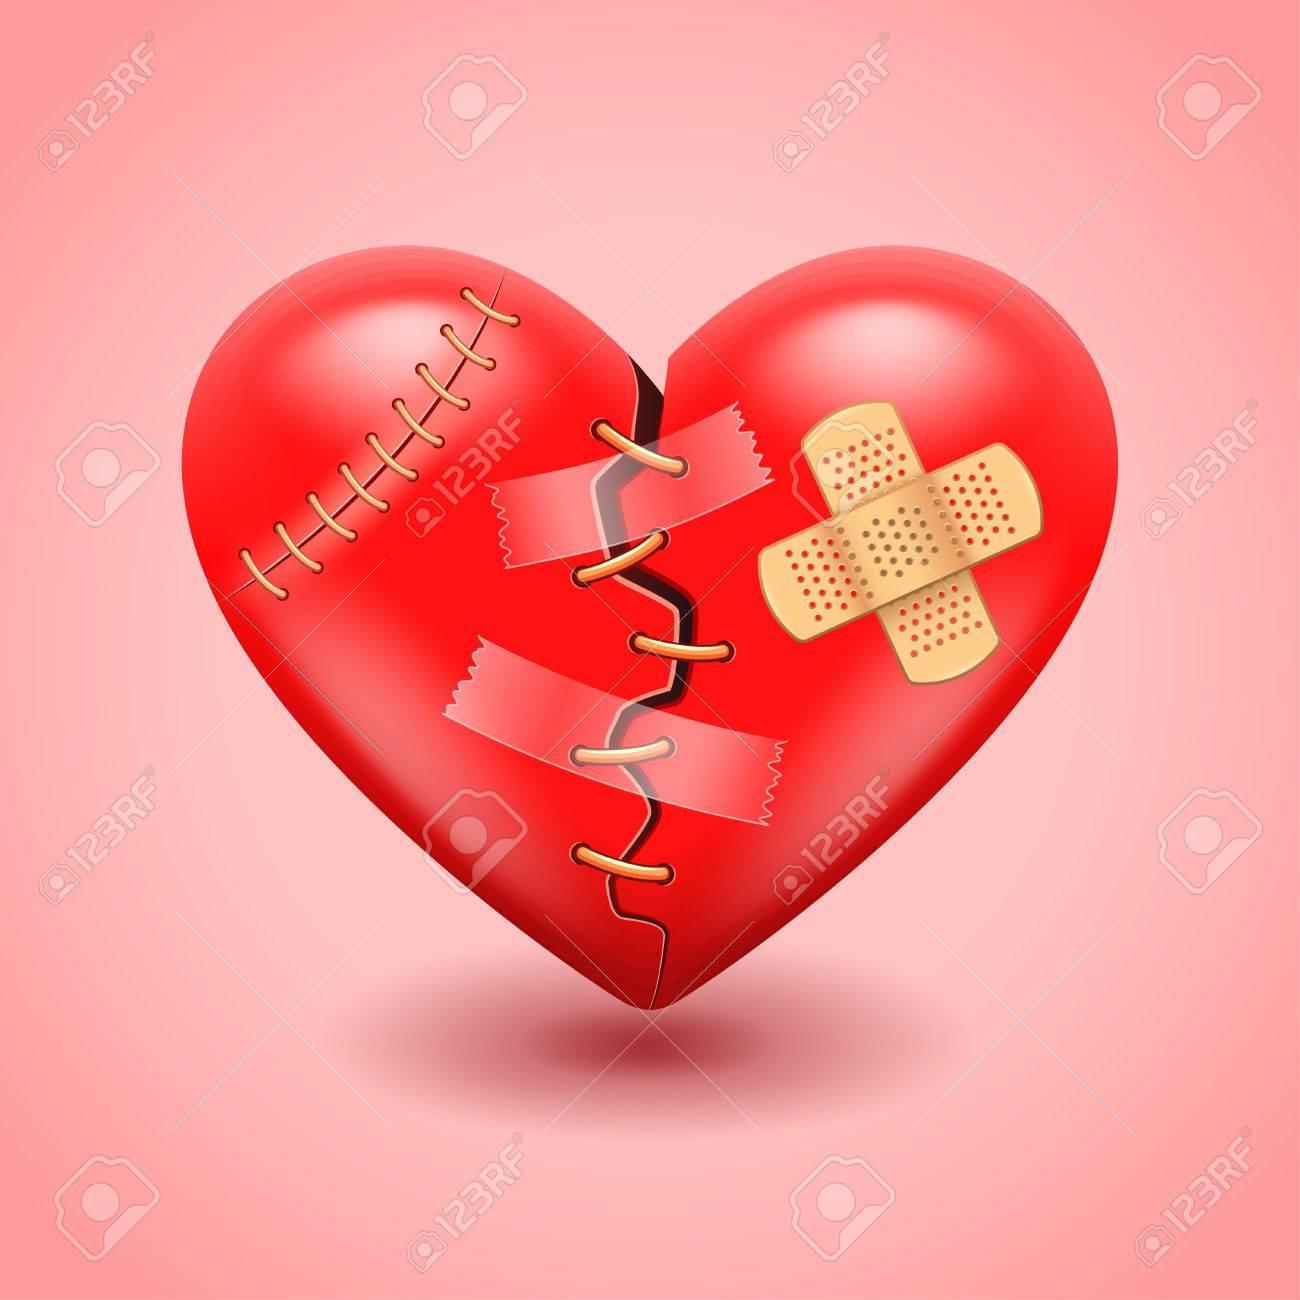 Big broken heart photo realistic vector background royalty free big broken heart photo realistic vector background stock vector 39879975 biocorpaavc Images